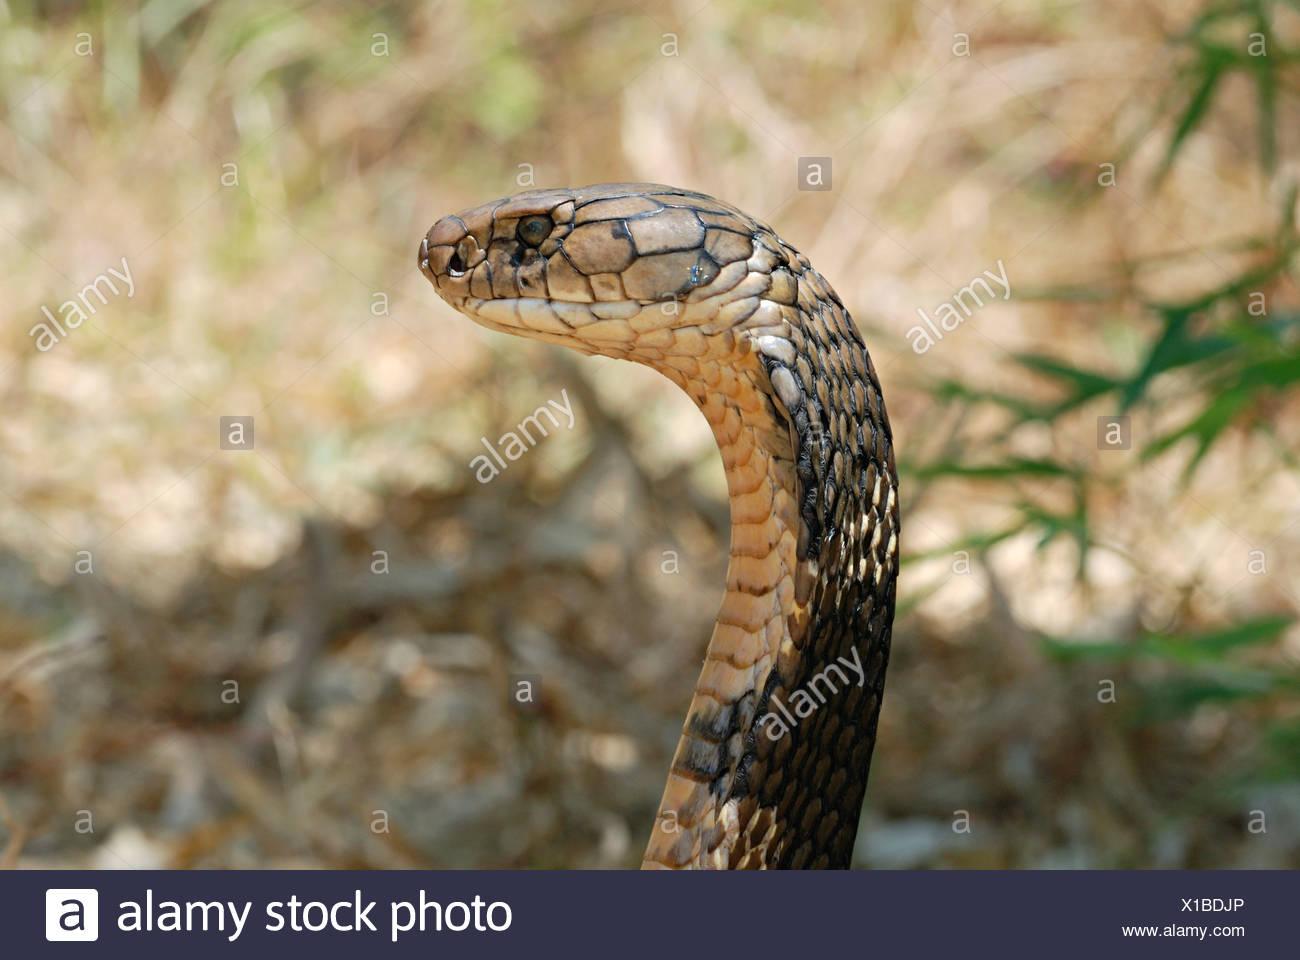 KING COBRA. Ophiophagus hannah. Rara venenosas. La serpiente venenosa más larga del mundo. Goa, India Foto de stock